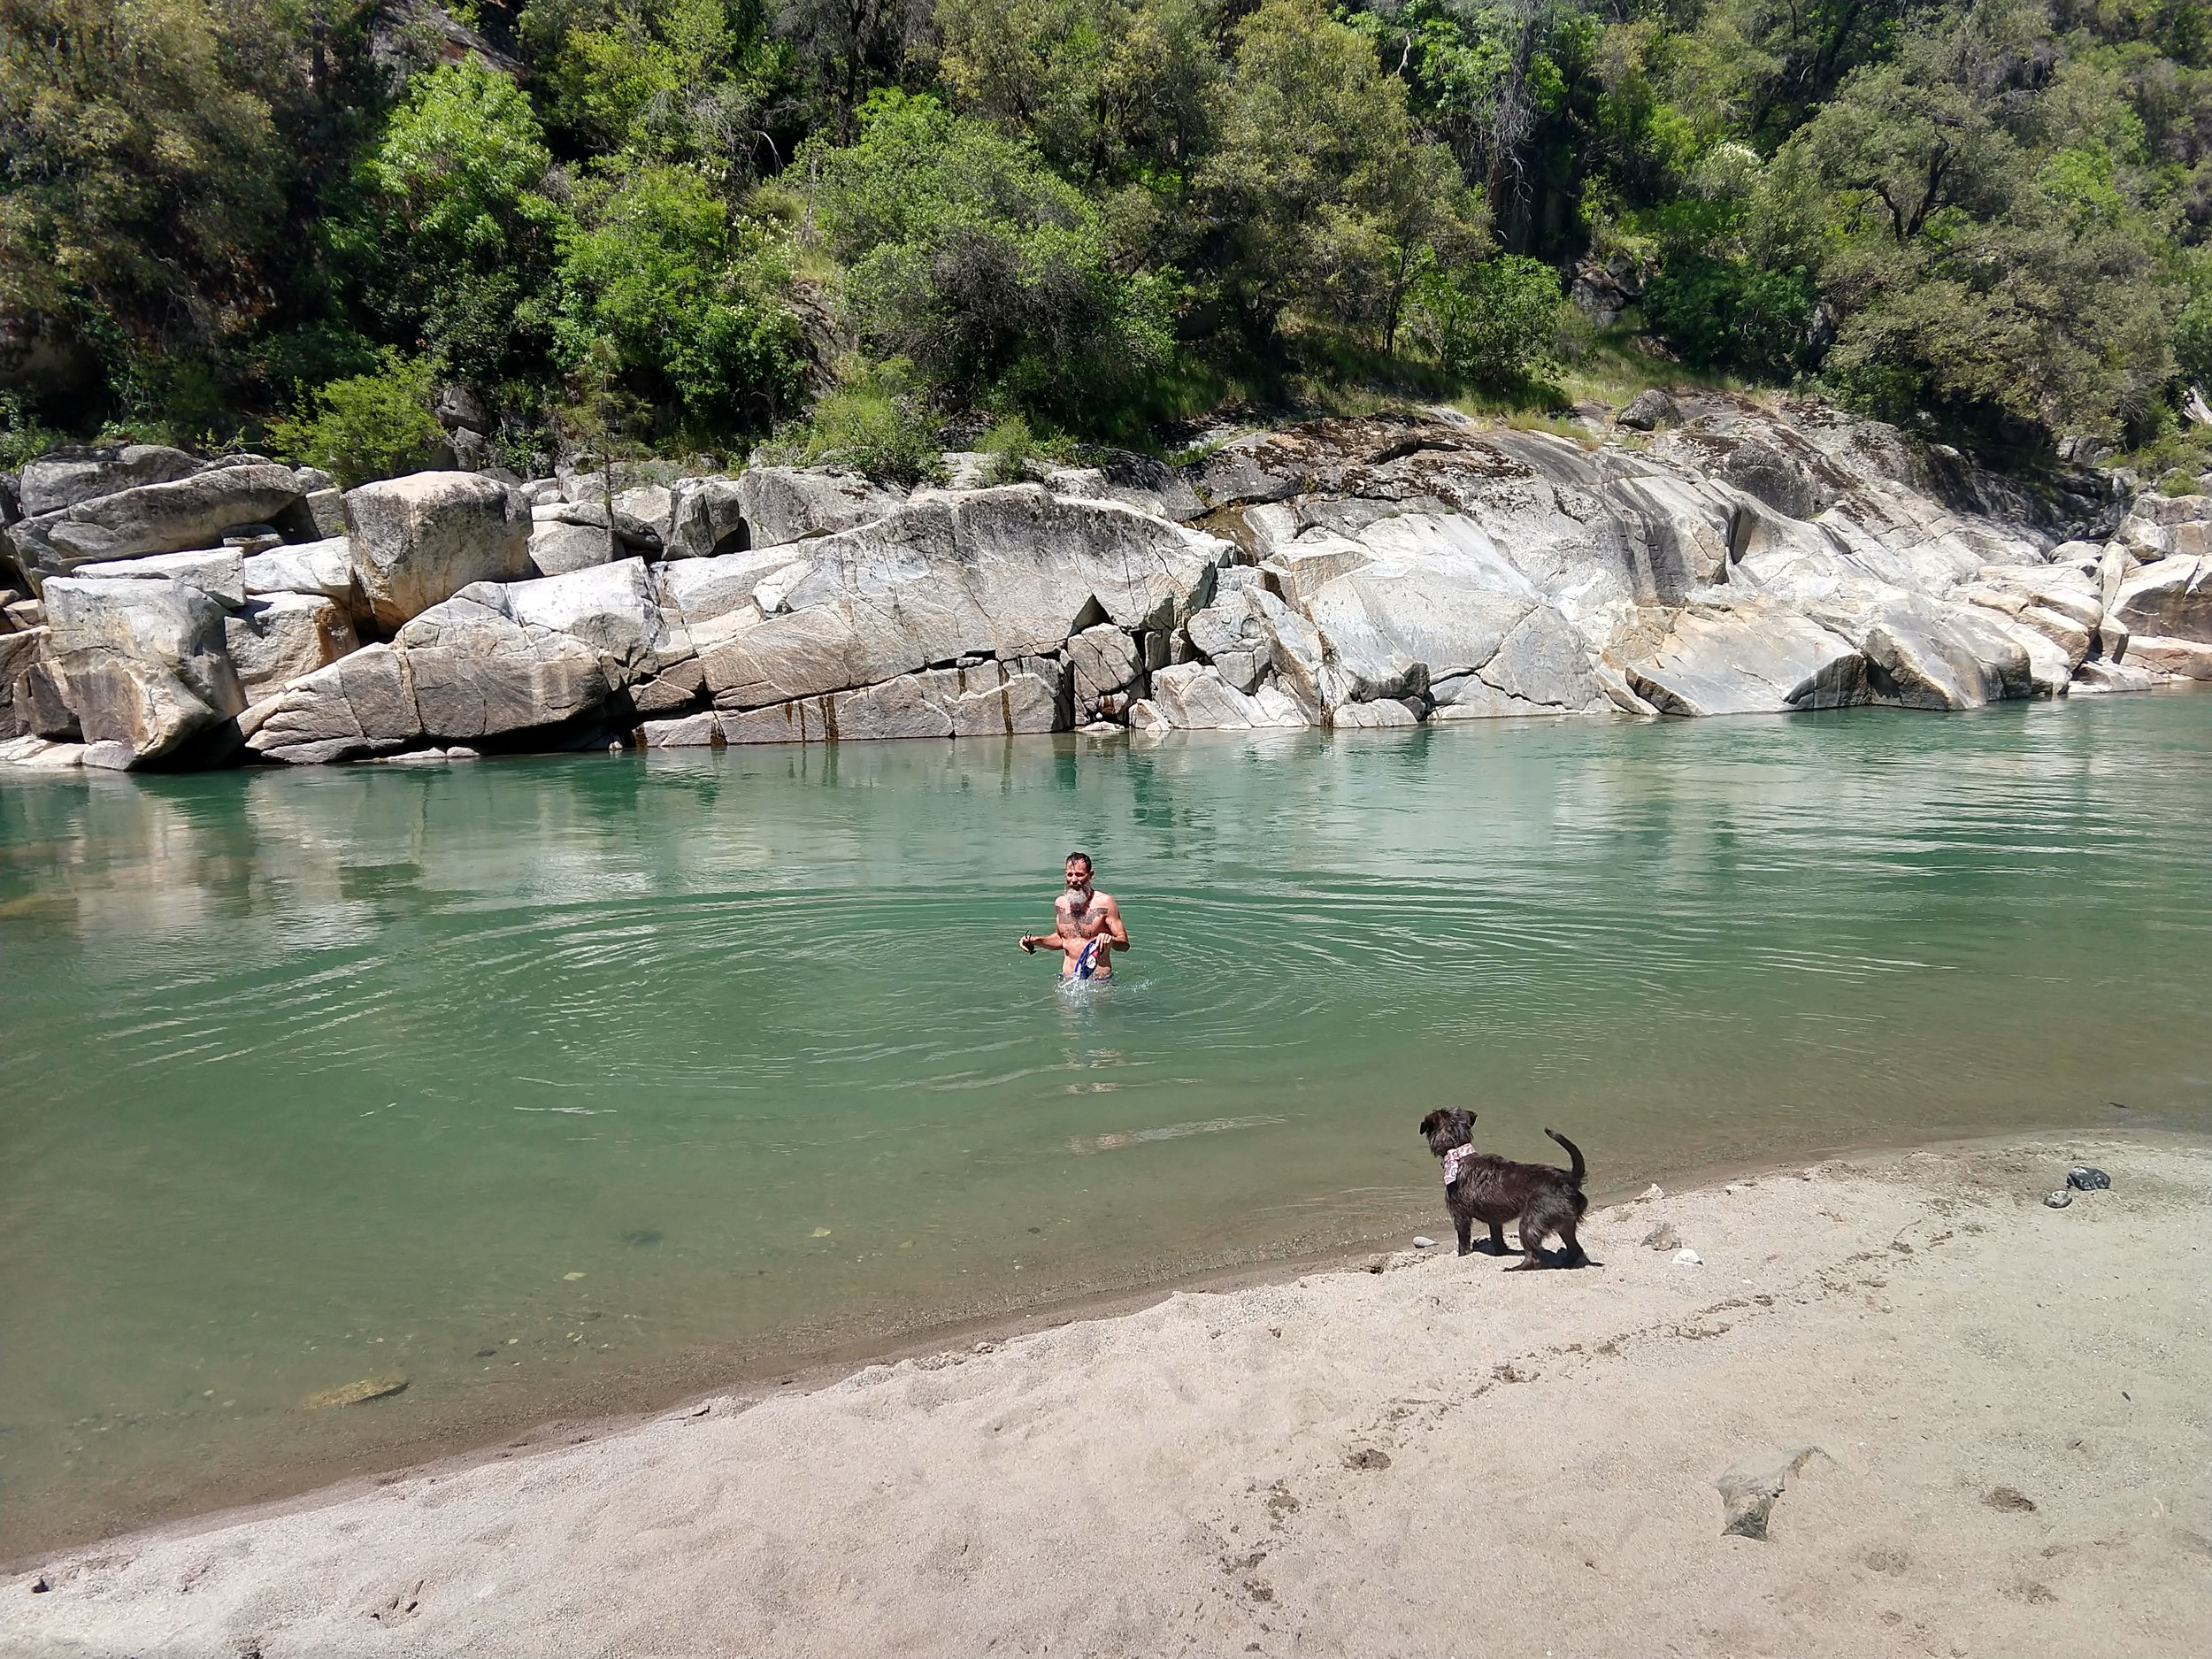 Day 2 - Yuba River